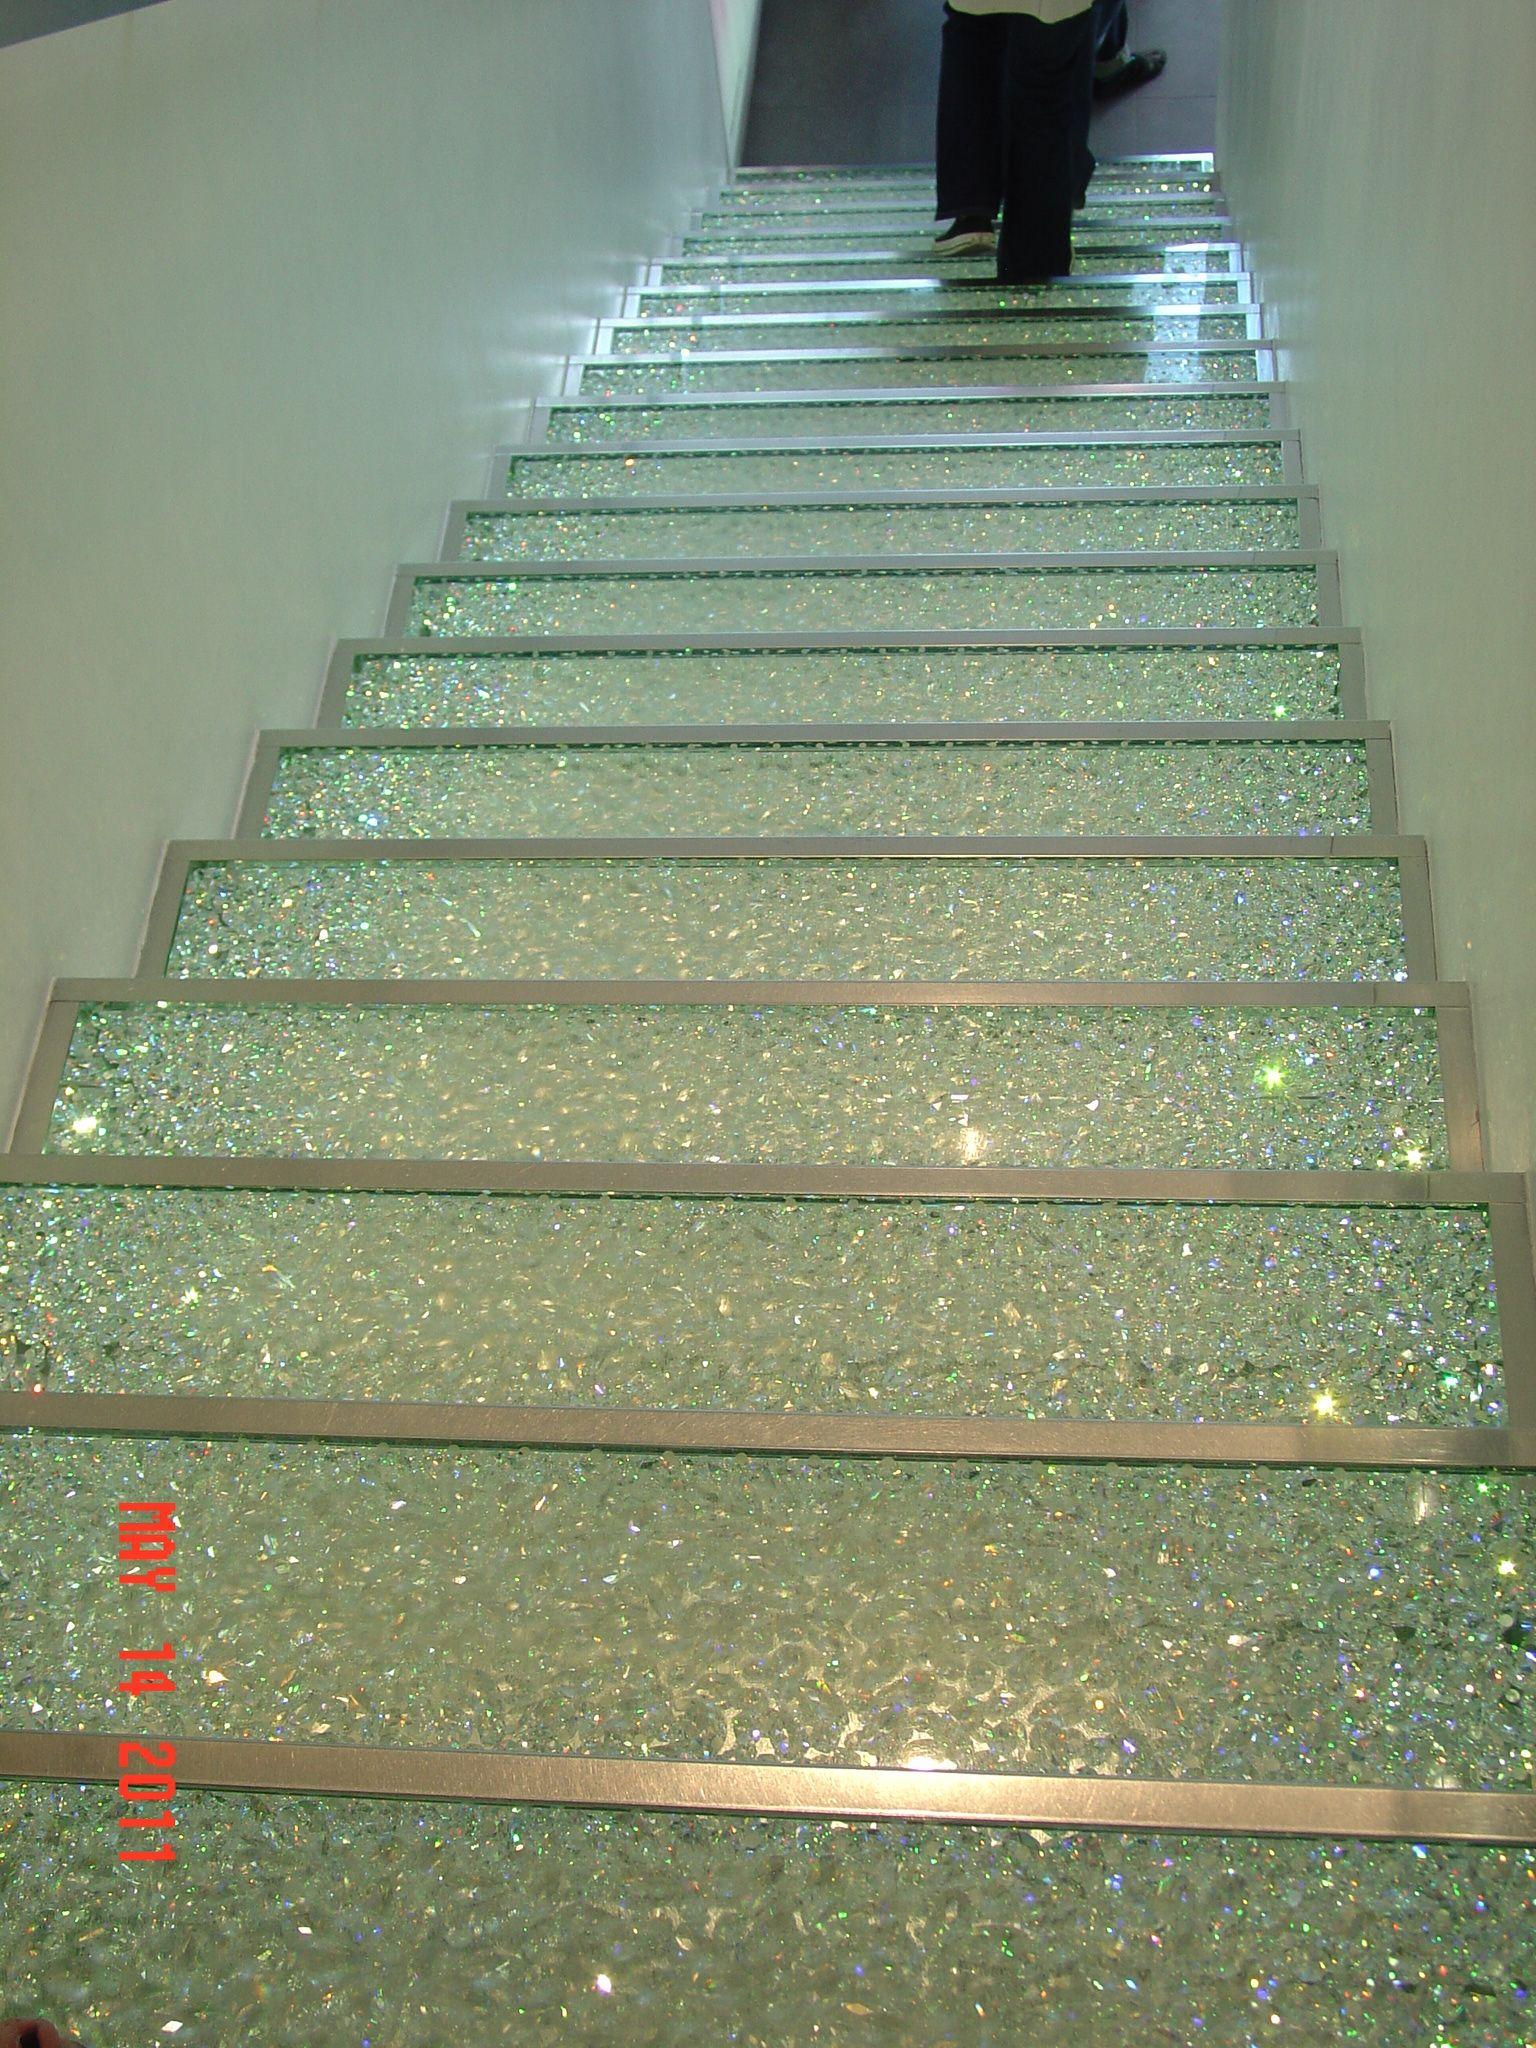 Swarovski Crystal Showroom, Paris, France